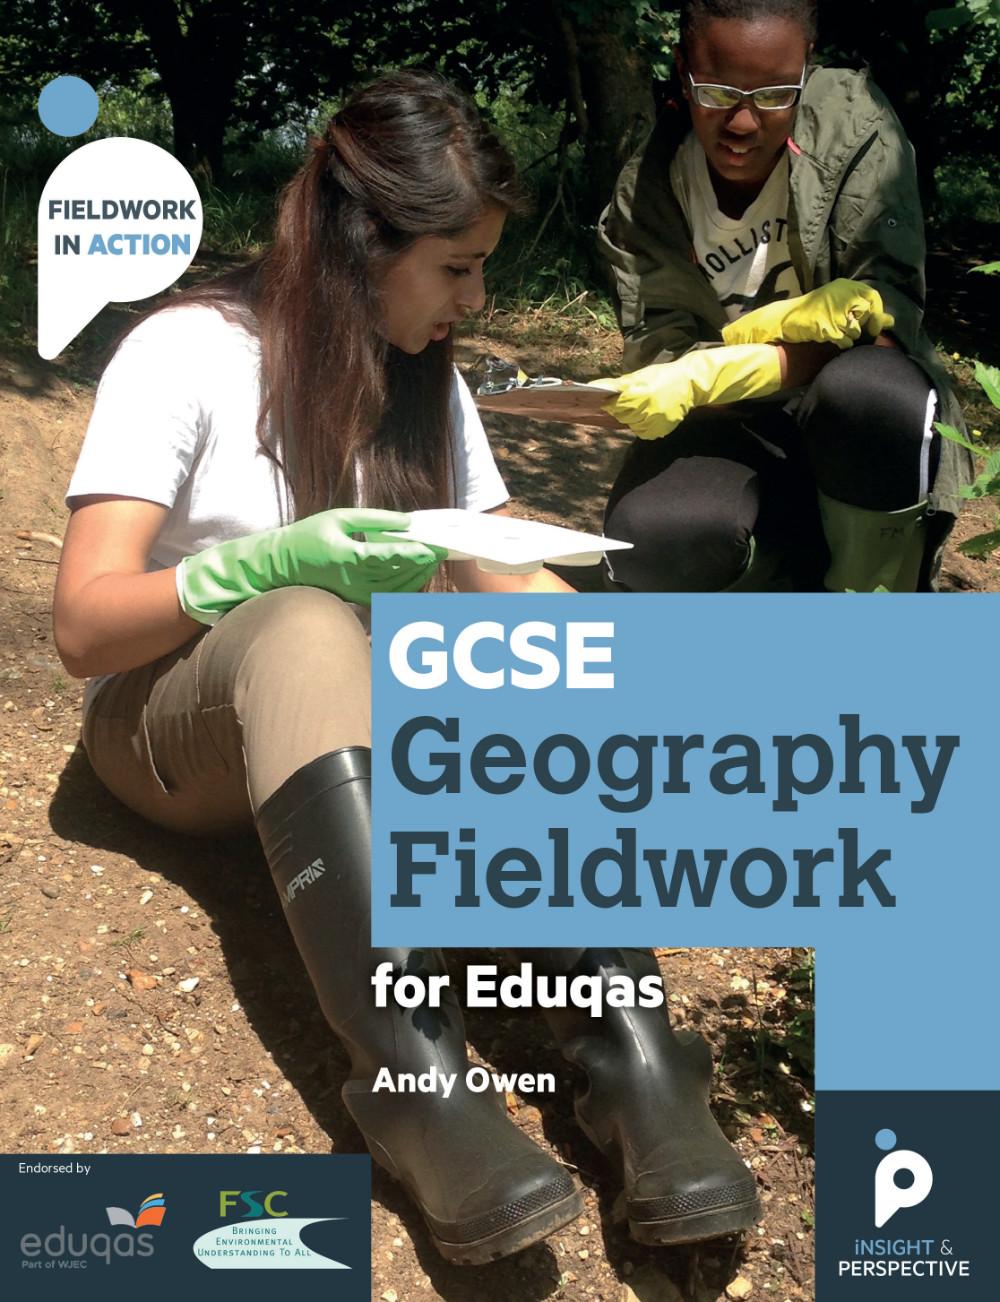 GCSE-Geography-Fieldwork-for-Eduqas.jpg